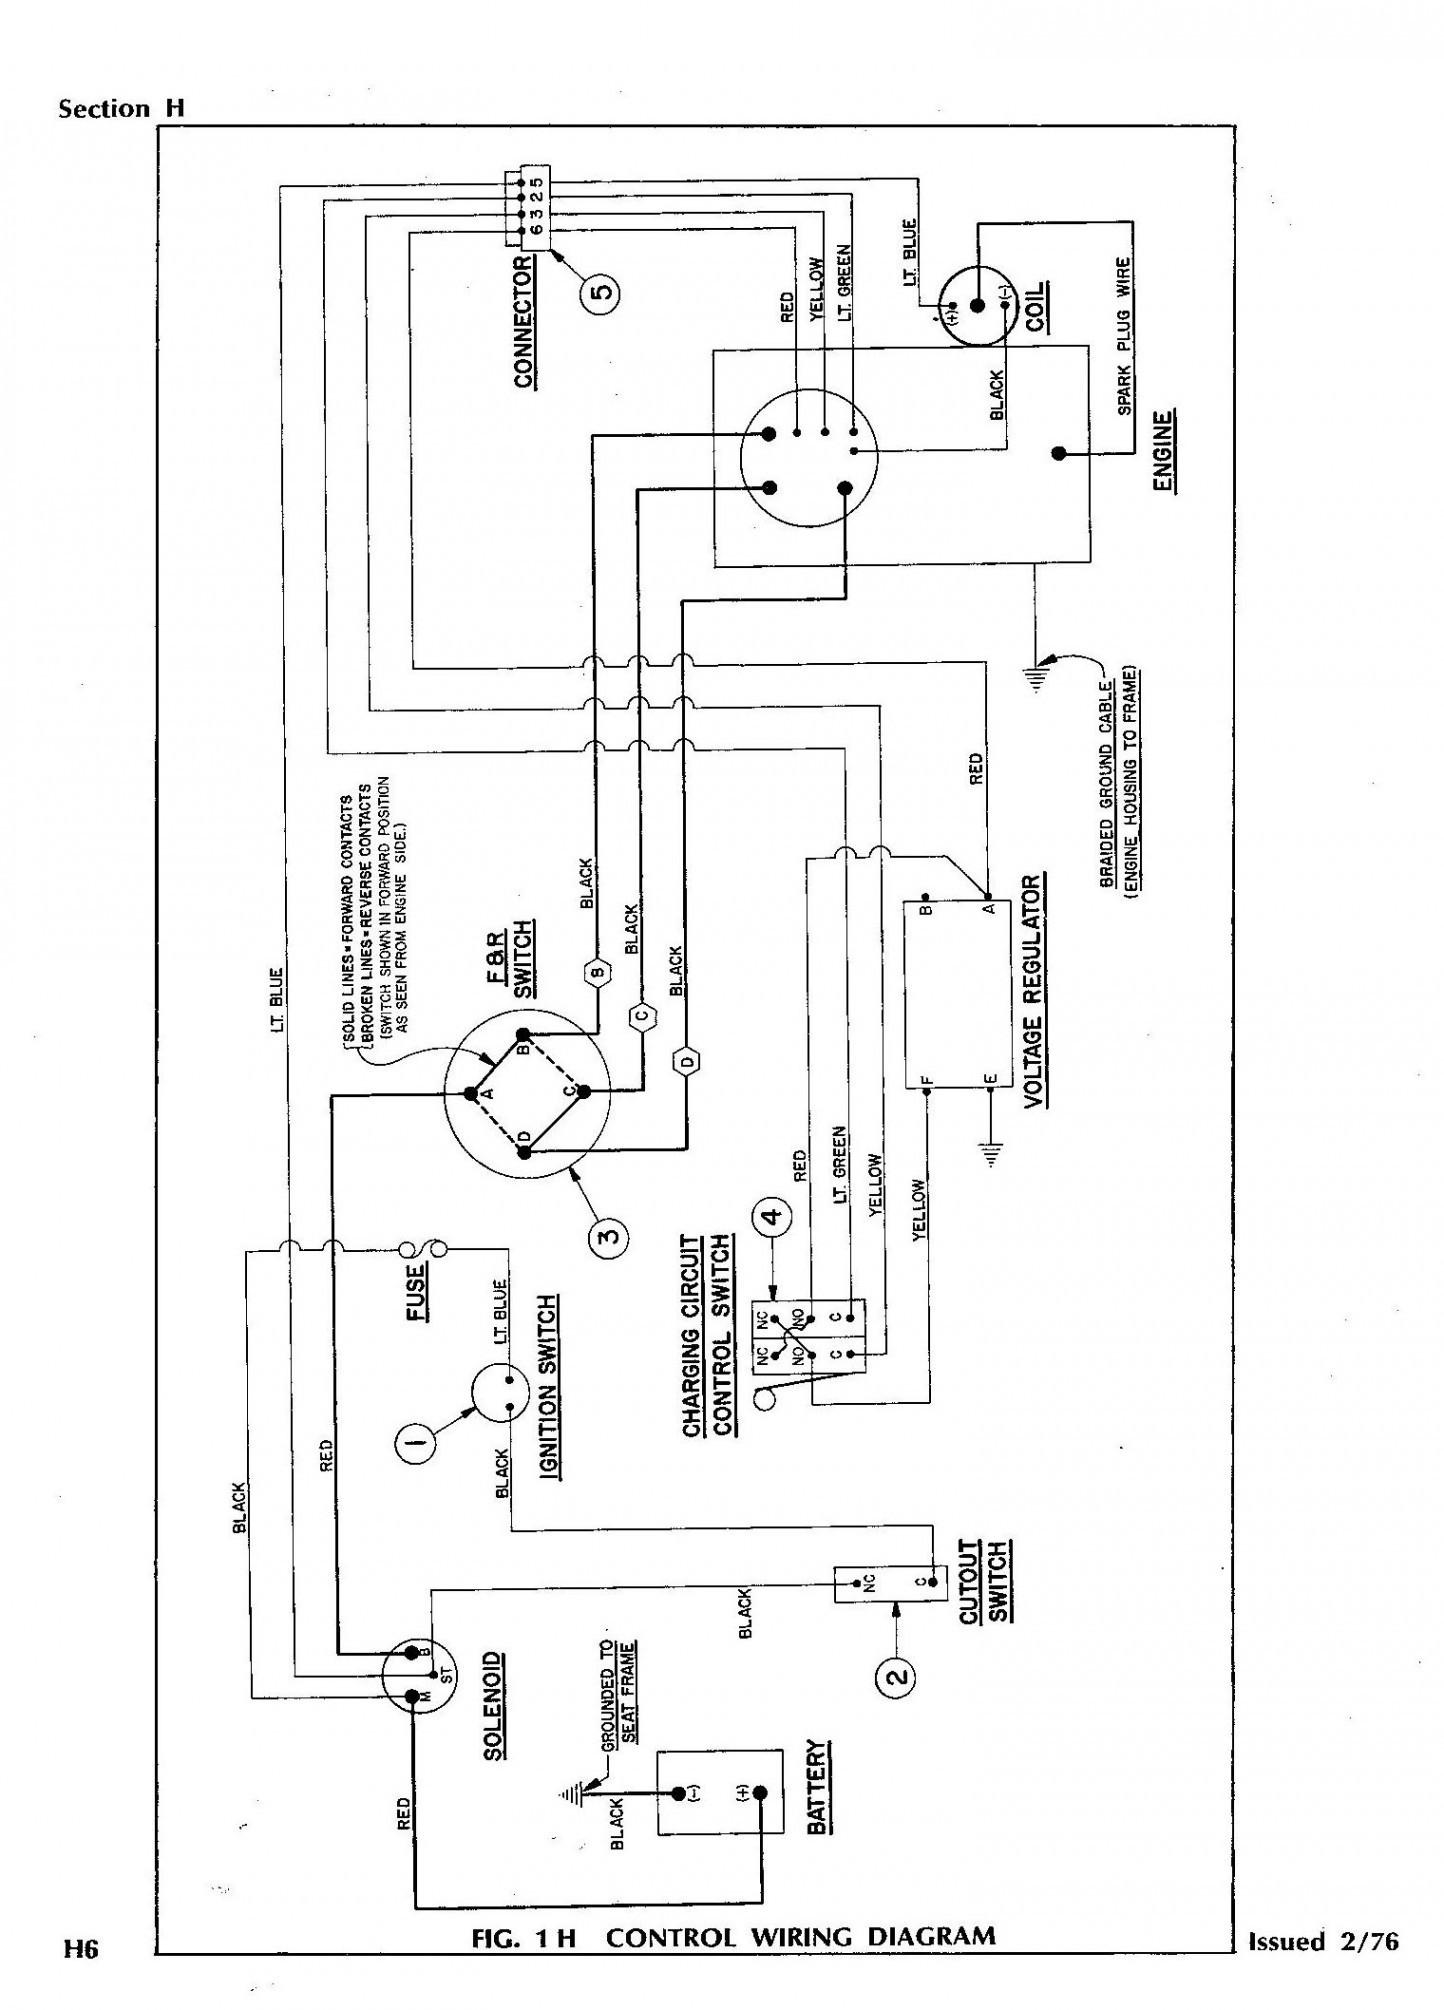 hight resolution of ezgo forward reverse switch wiring diagram 1996 ezgo txt gas wiring diagram save ezgo golf